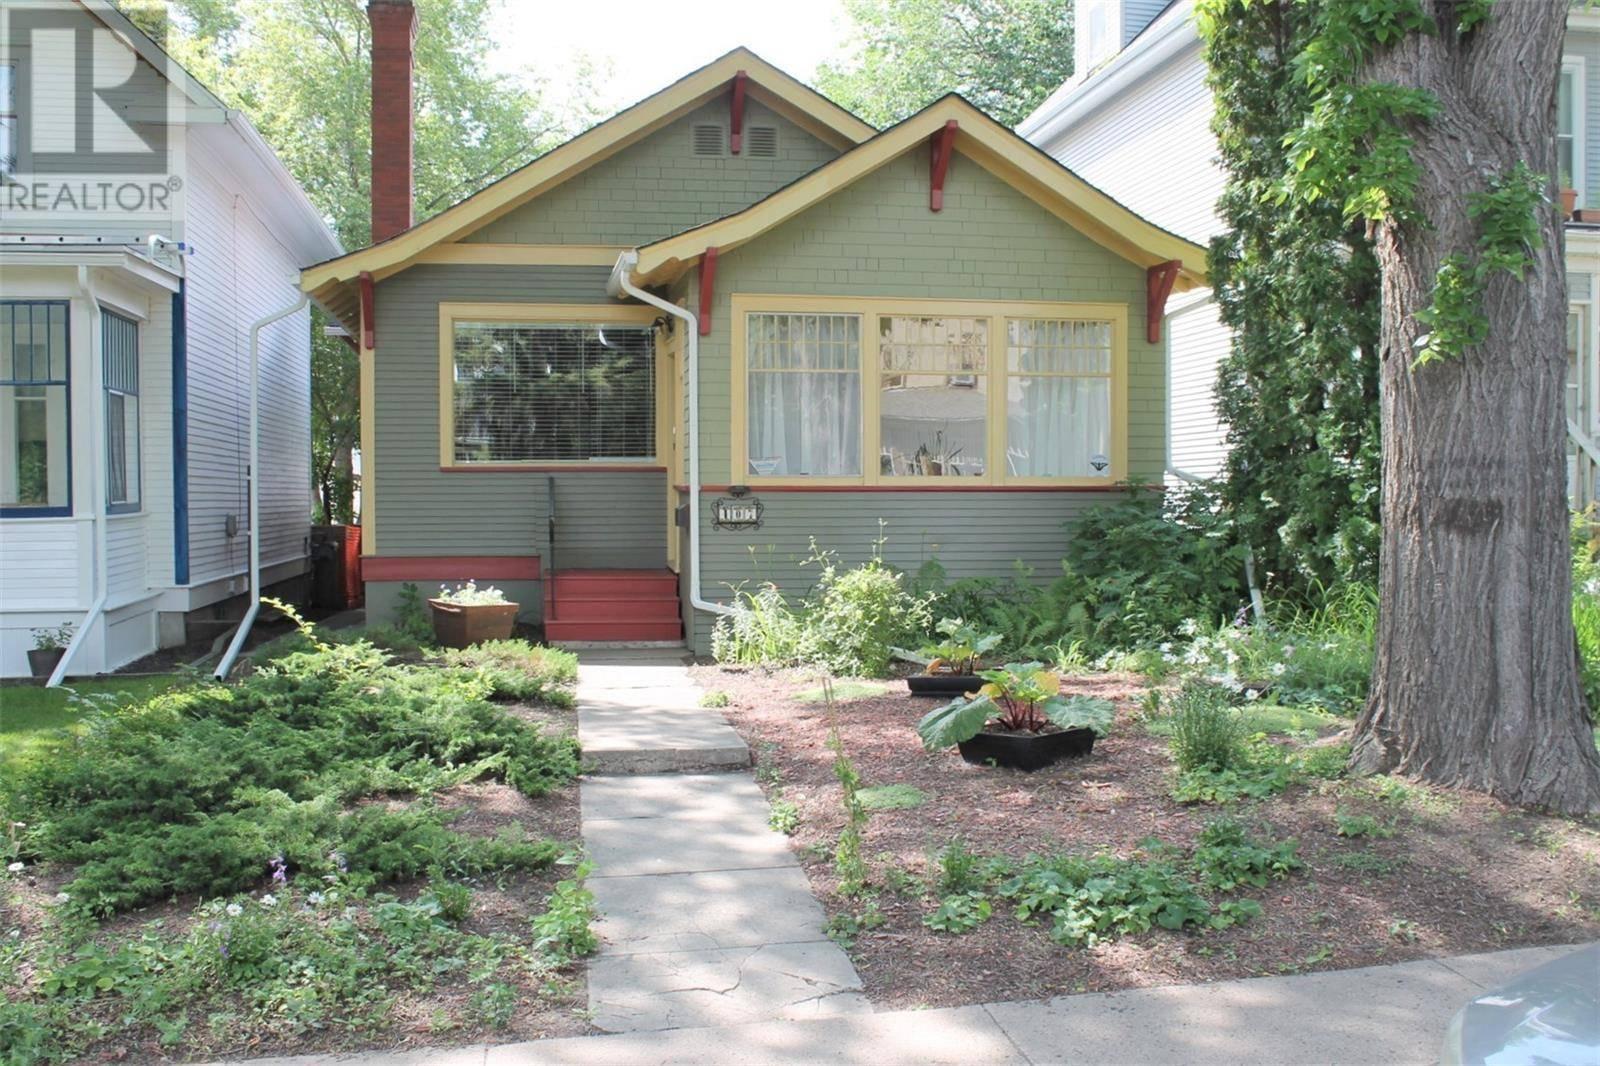 House for sale at 407 28th St W Saskatoon Saskatchewan - MLS: SK782750